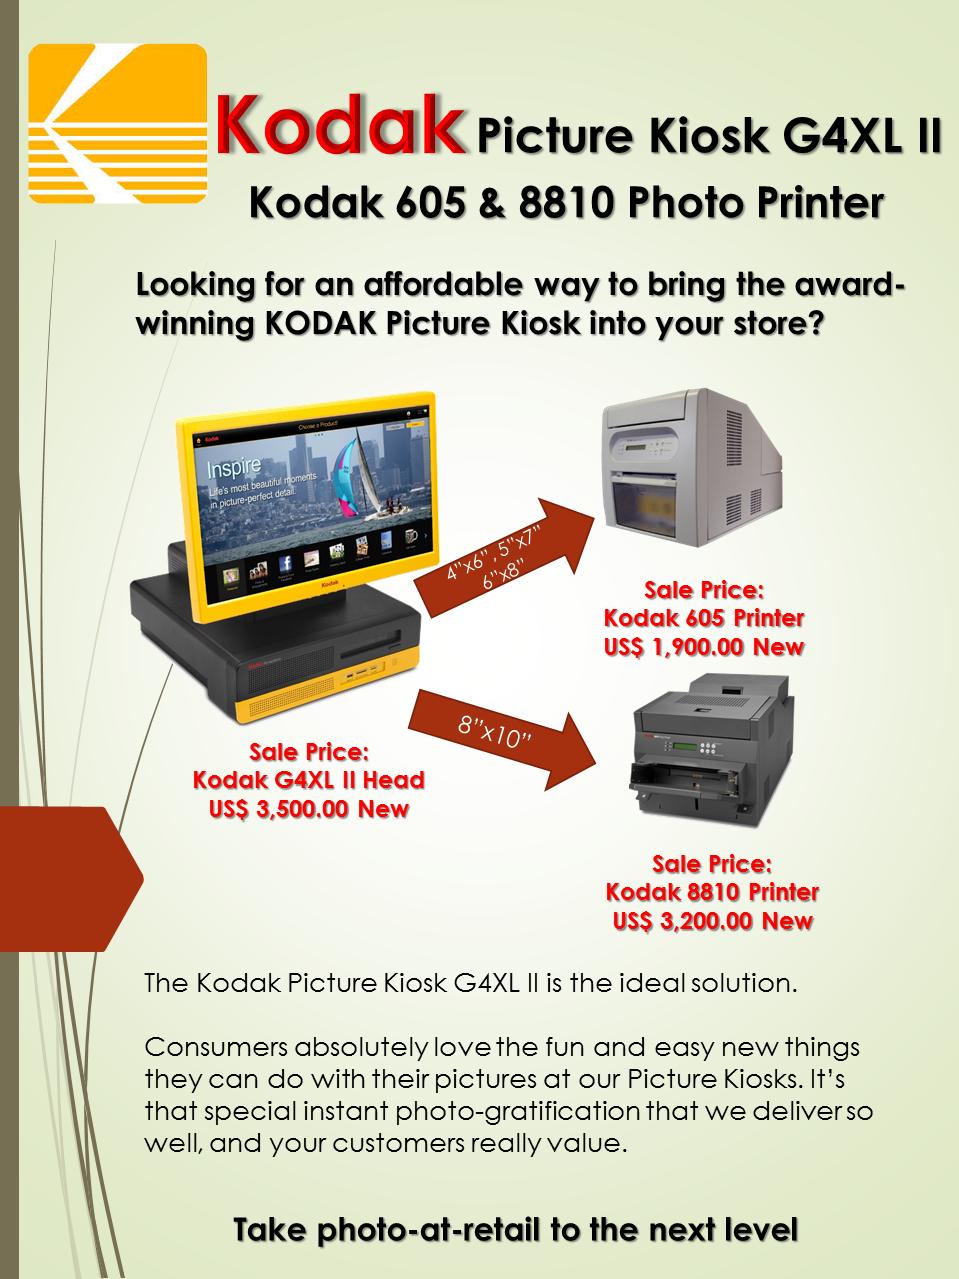 Kodak Picture Kiosk G4XL II